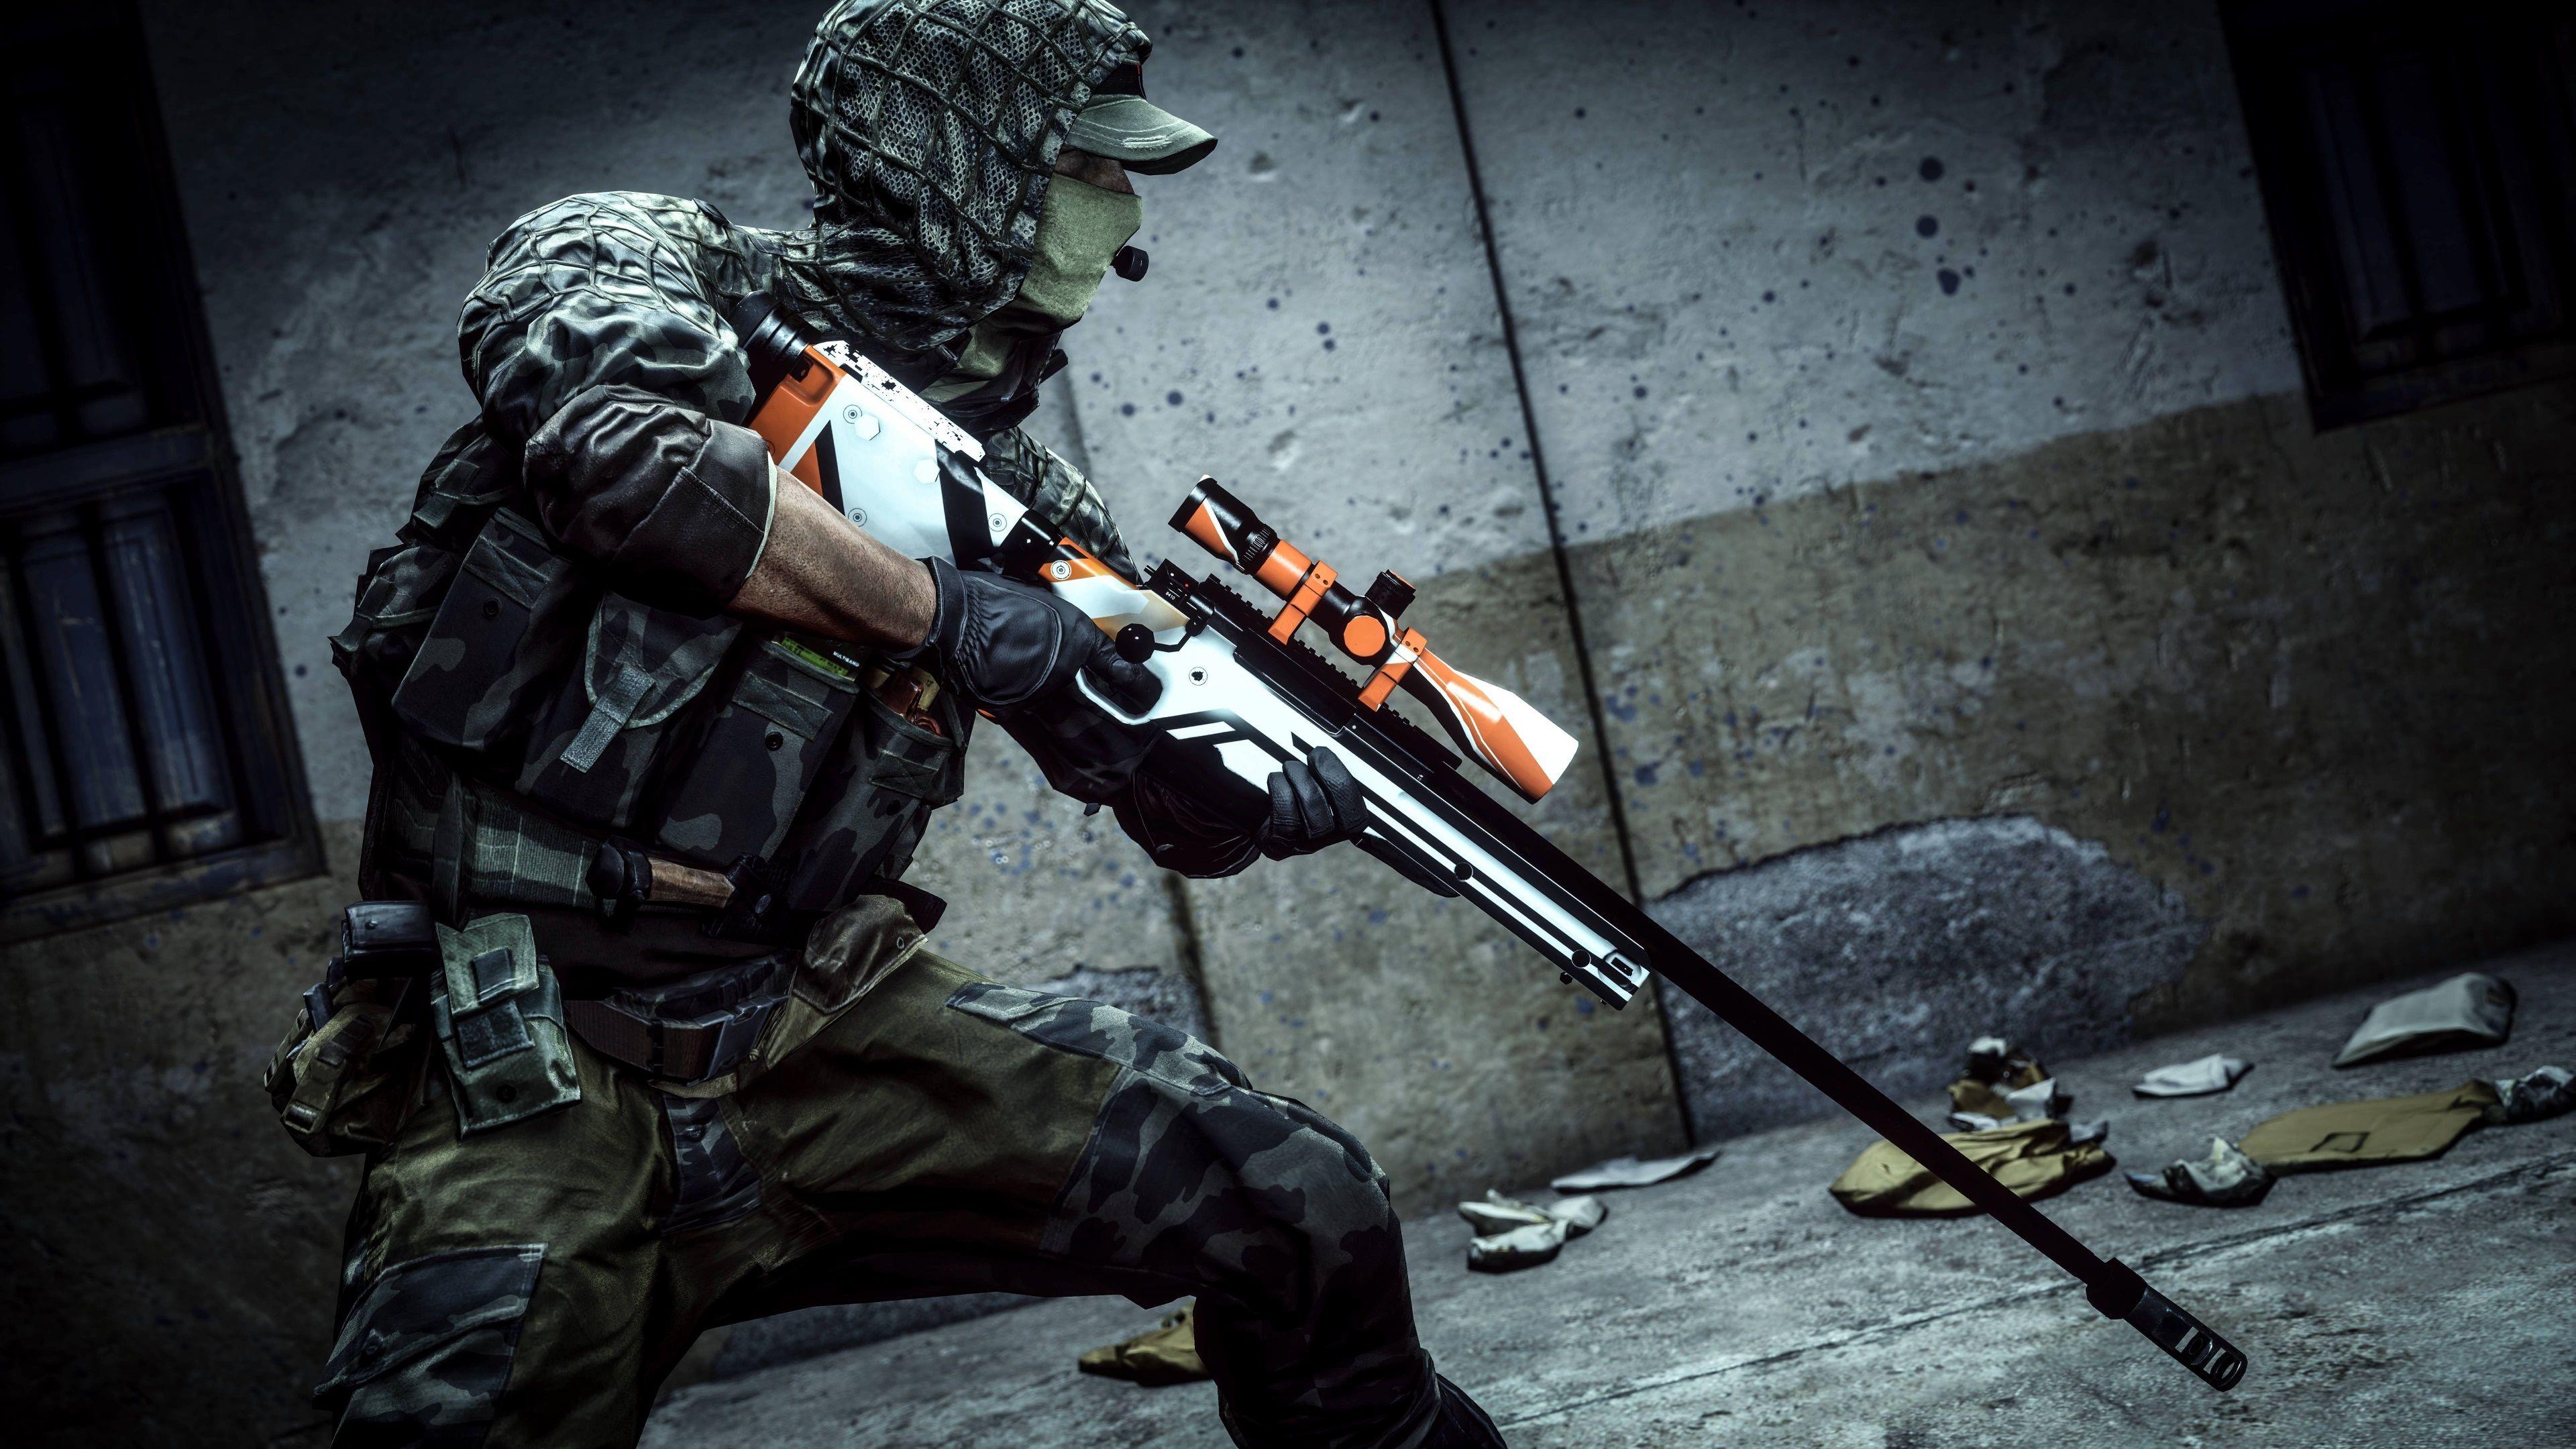 3840x2160 Battlefield 4 4k Desktop Wallpaper Cool Battlefield 8k Wallpaper Sniper